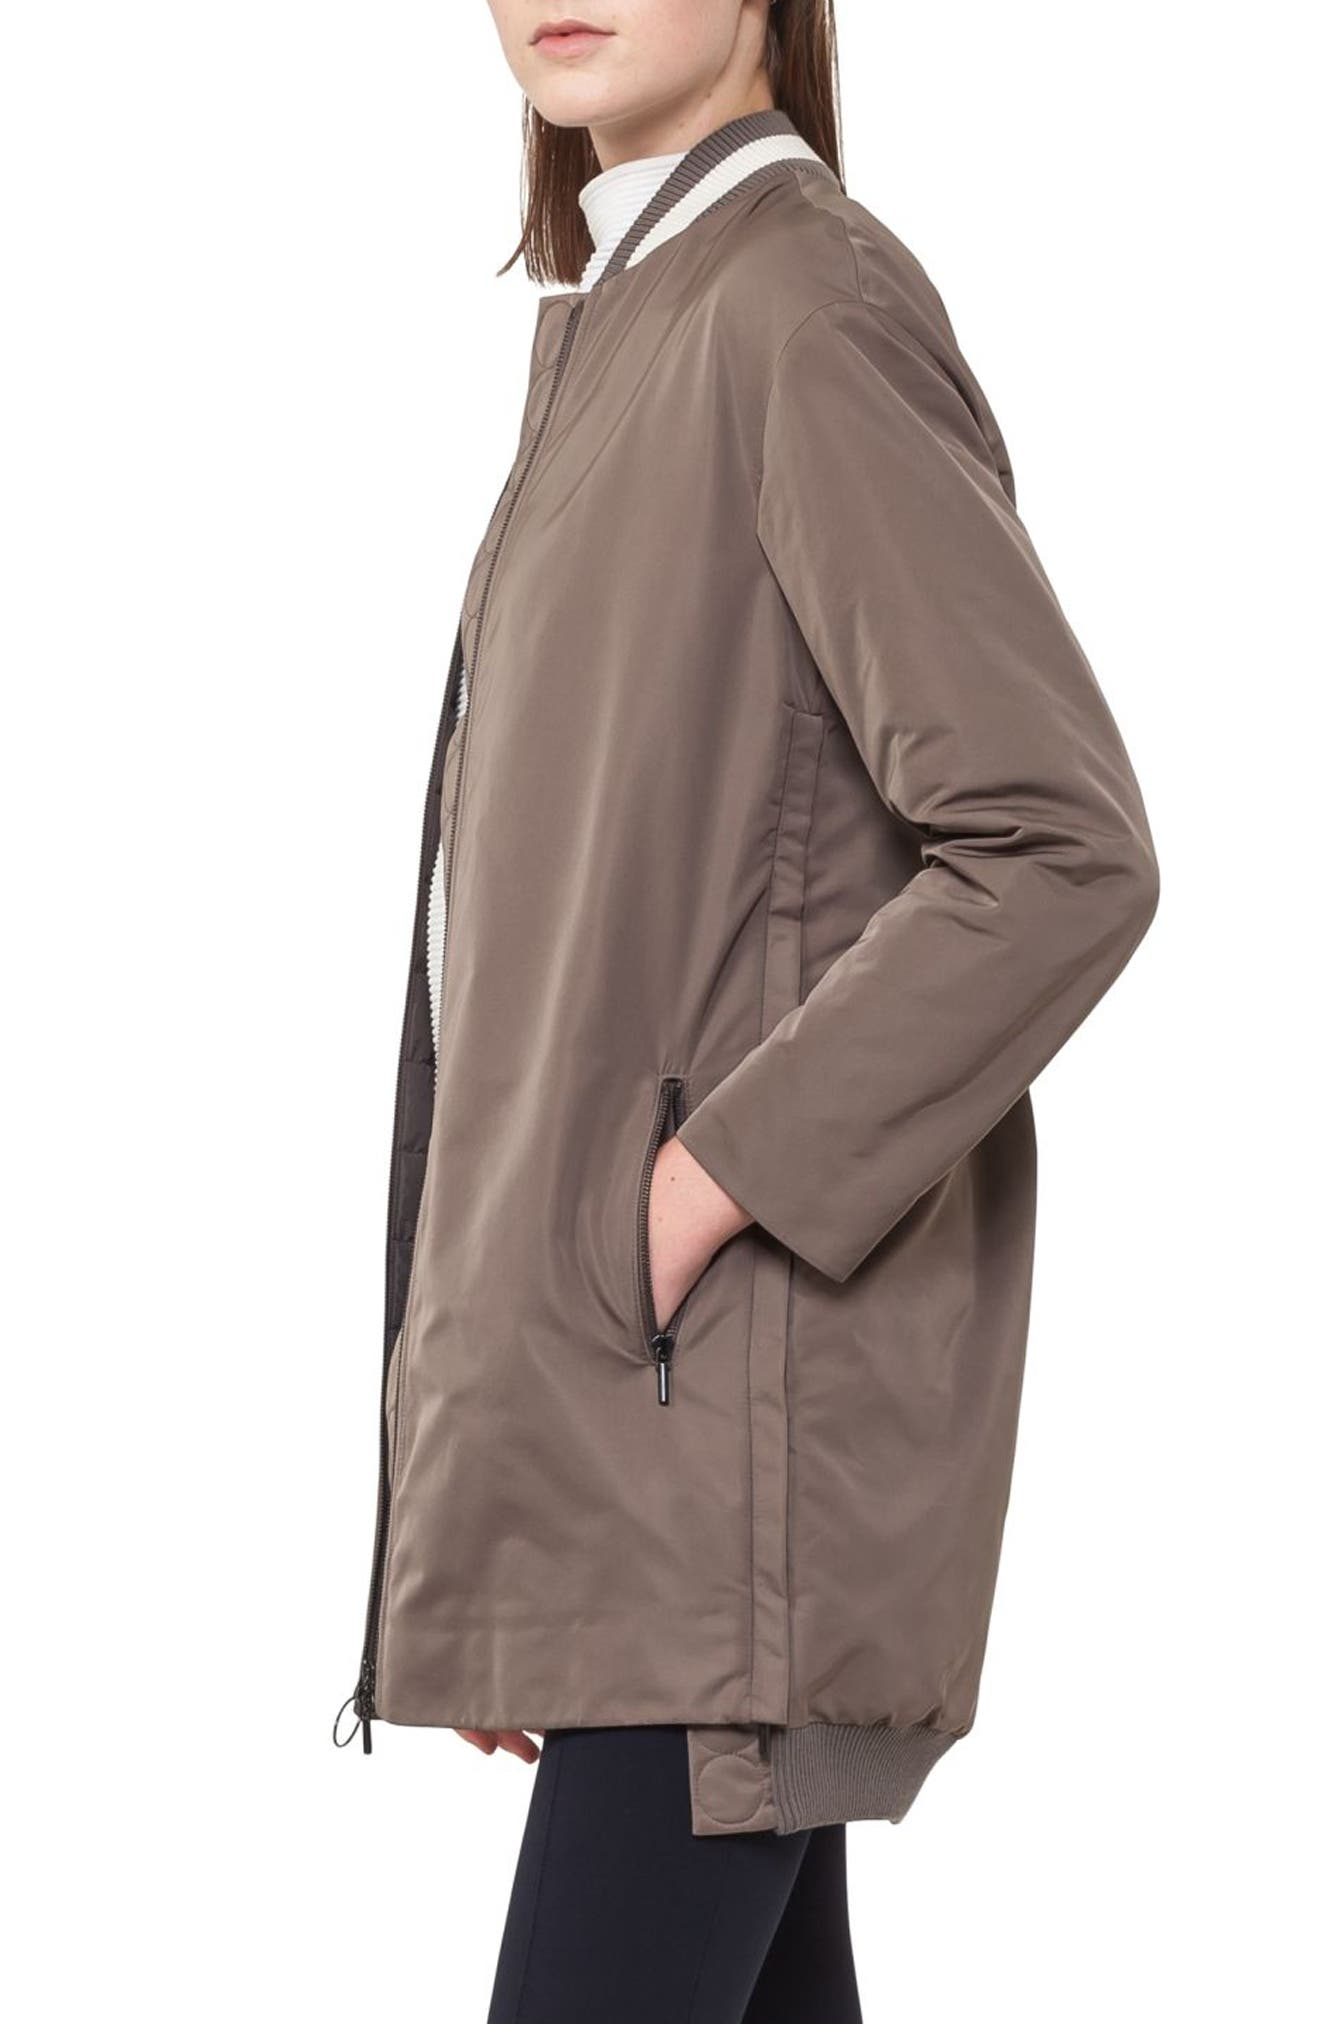 Techno Bomber Coat,                             Alternate thumbnail 3, color,                             250